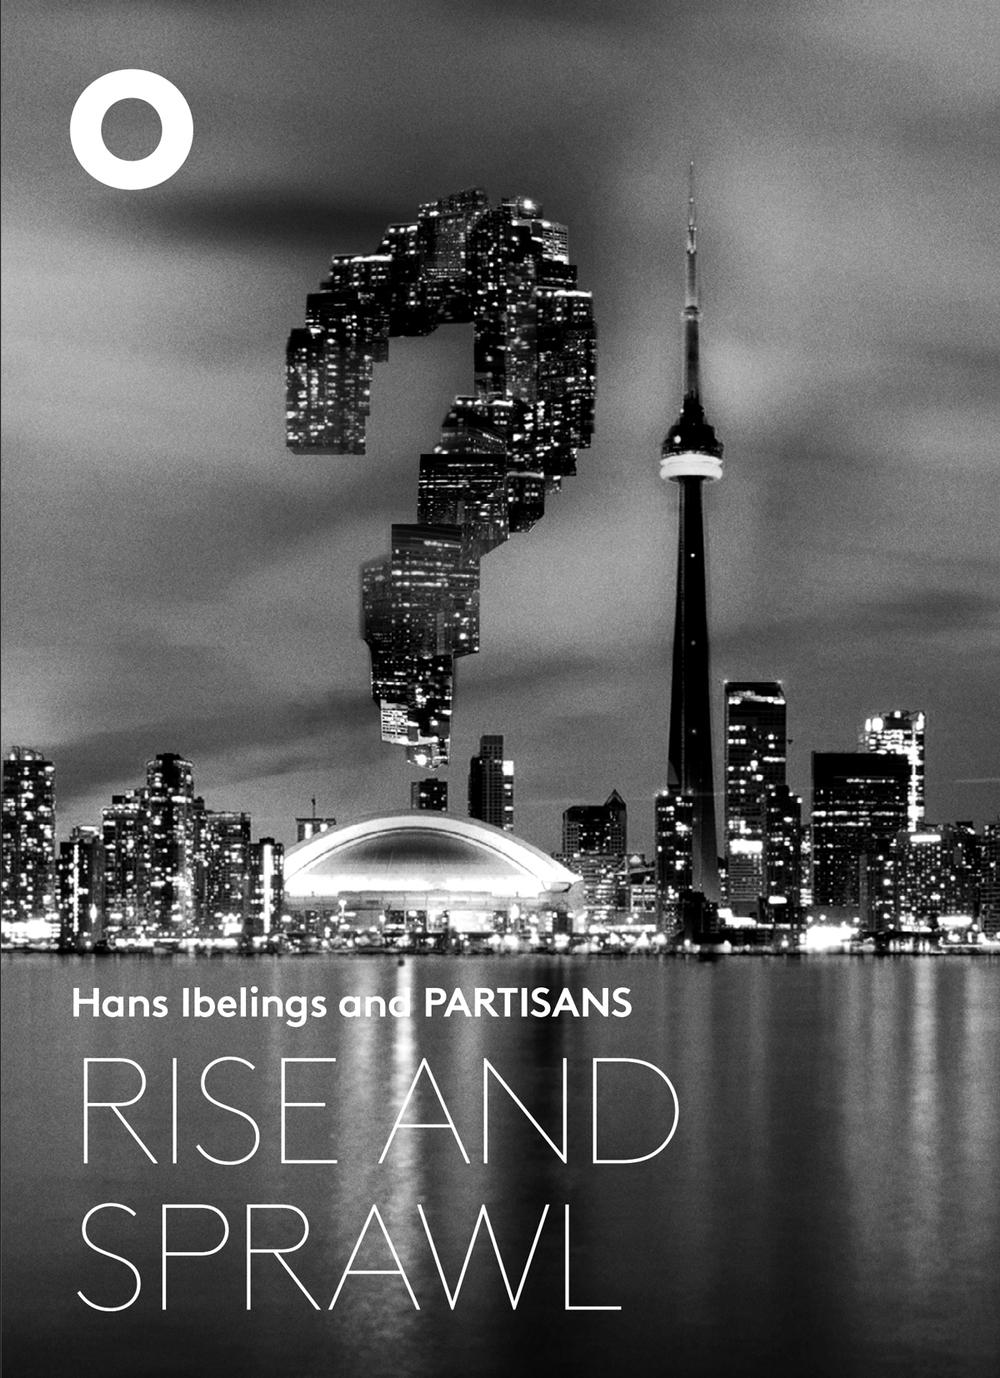 Afbeeldingsresultaat voor rise and sprawl